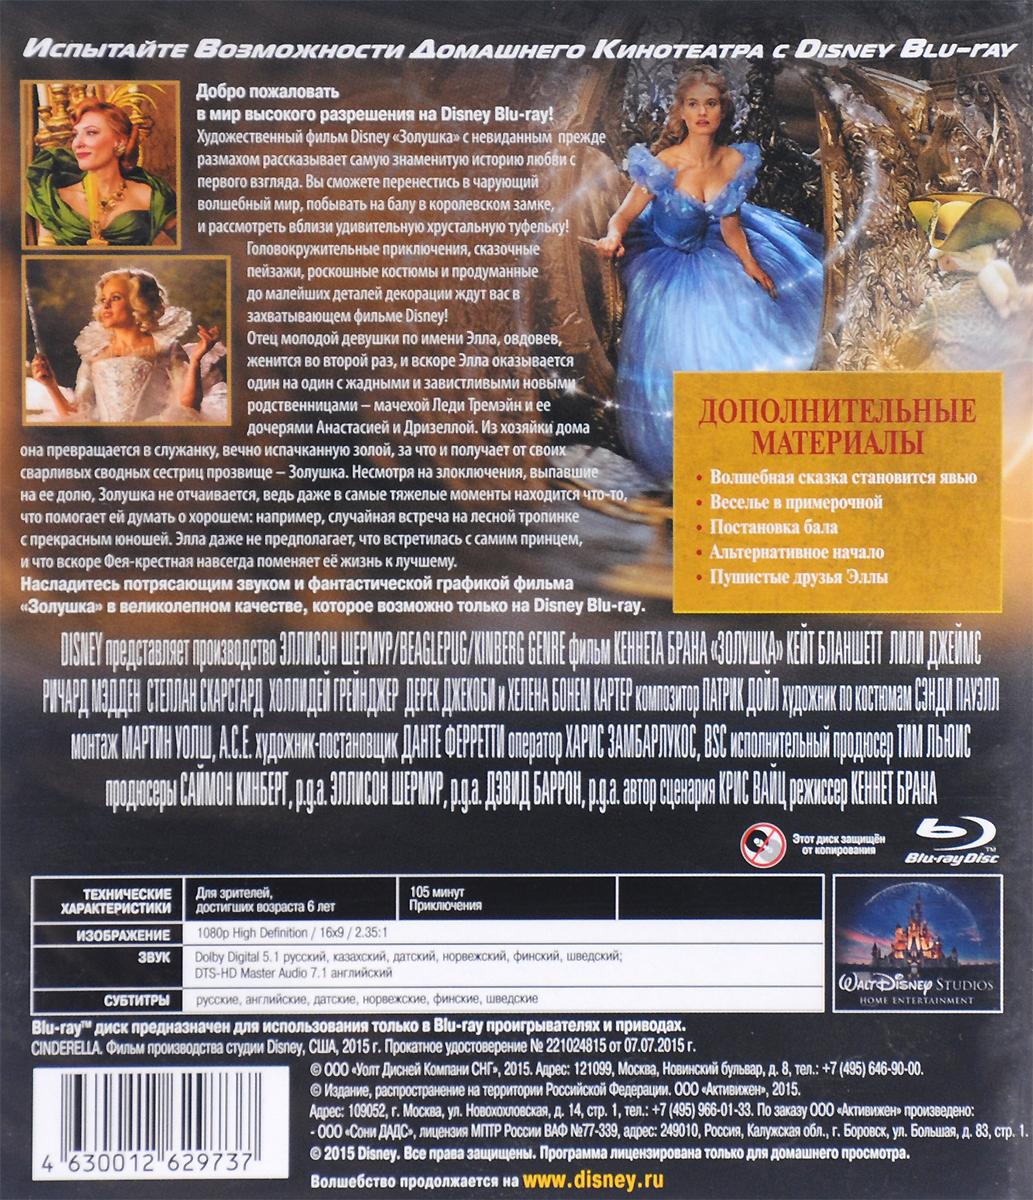 Золушка (Blu-ray) Walt Disney Pictures,Allison Shearmur Productions,Beagle Pug Films,Genre Films